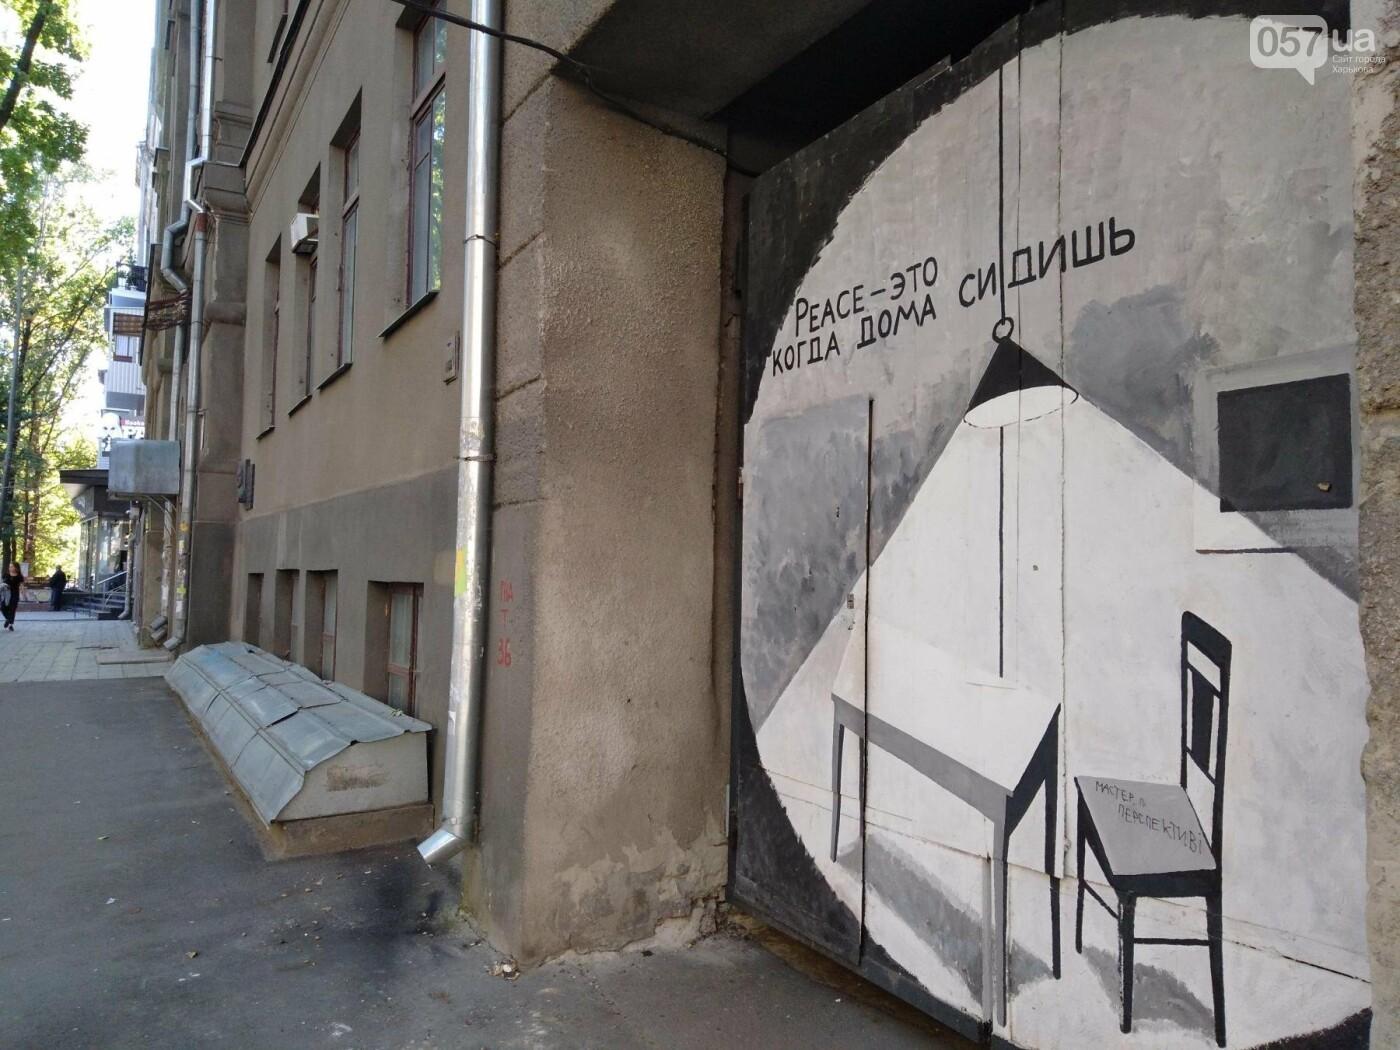 Стрит-арт Гамлета в Харькове: ТОП-10 граффити художника, - ФОТО, фото-18